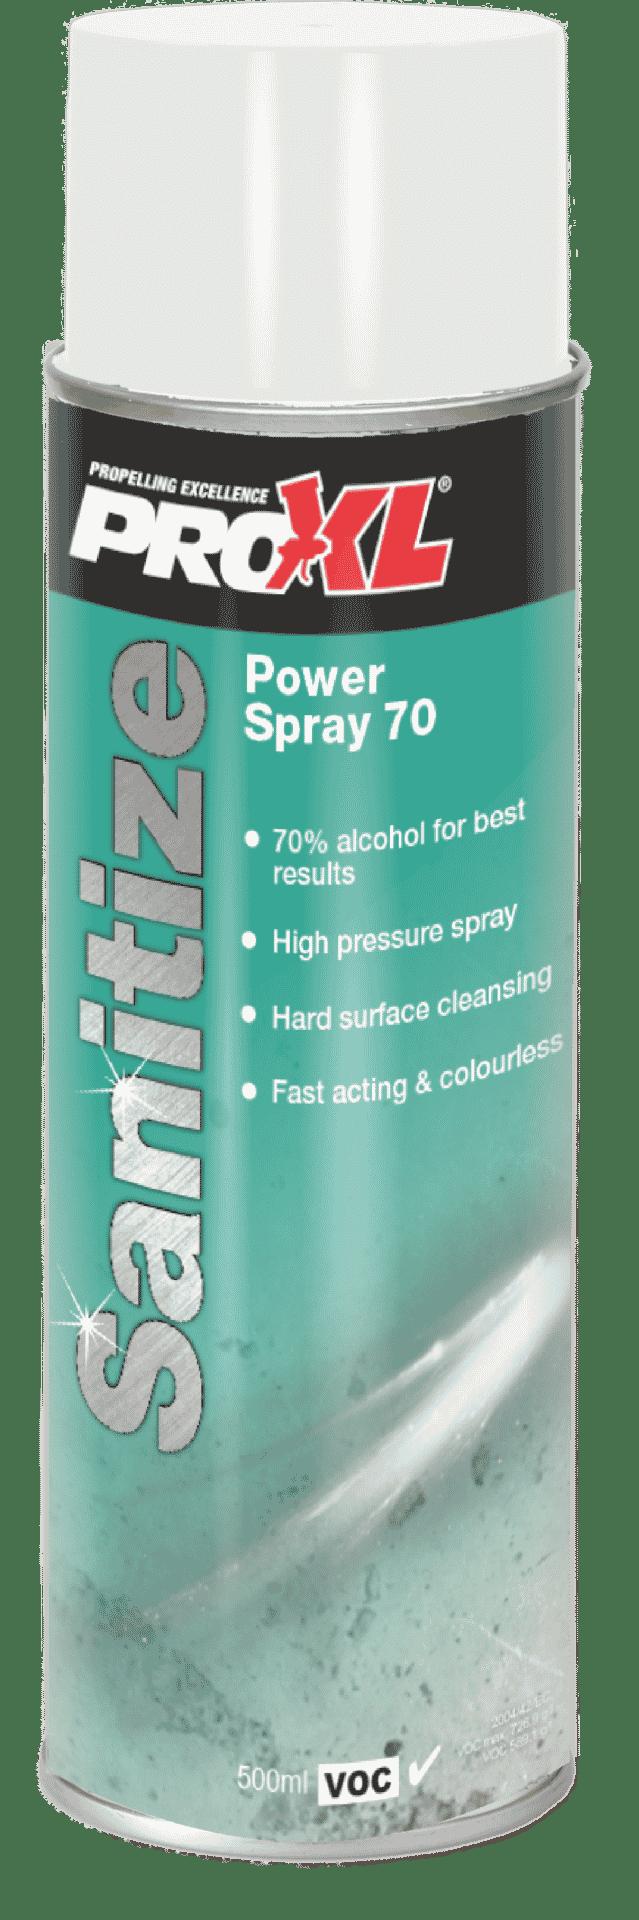 Power Spray 70 Aerosol (500ml) Product Image